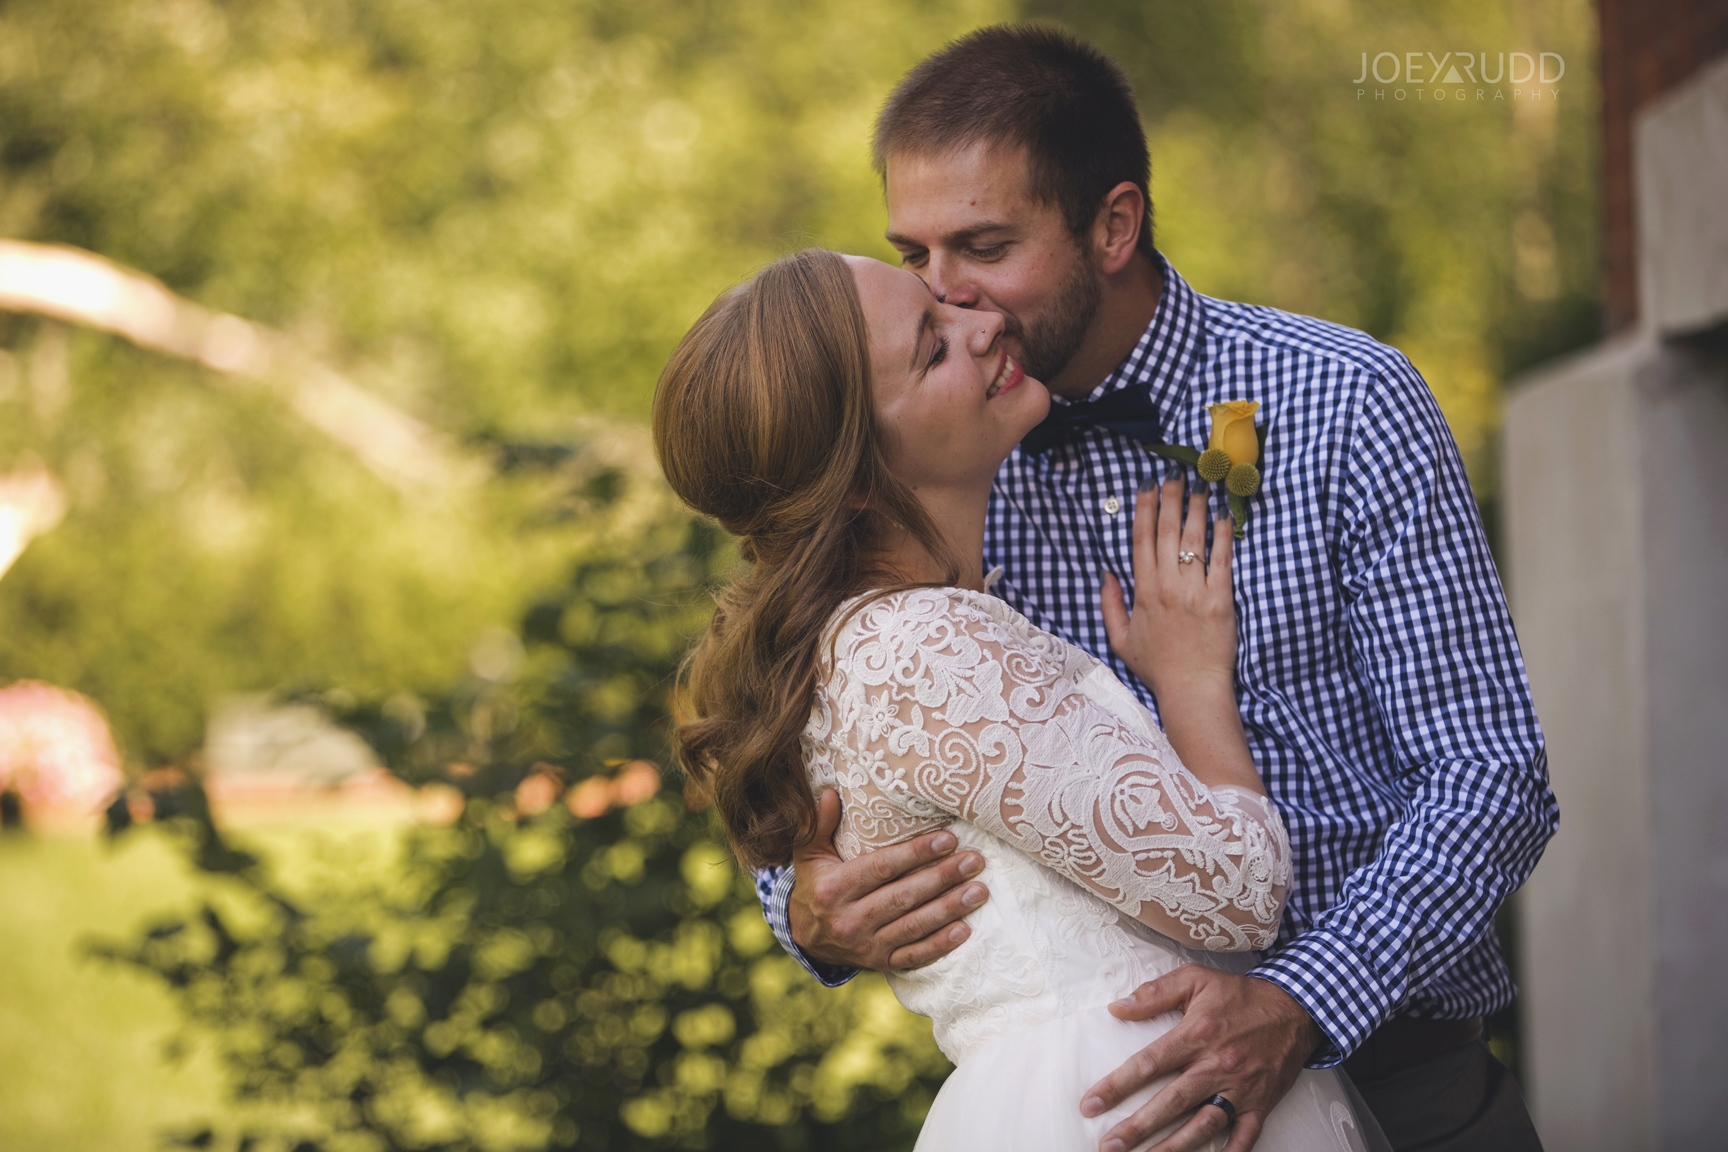 Ottawa Elopement by Joey Rudd Photography Ottawa Wedding Photographer Mer Bleue Ottawa Wedding Chapel Couple Love